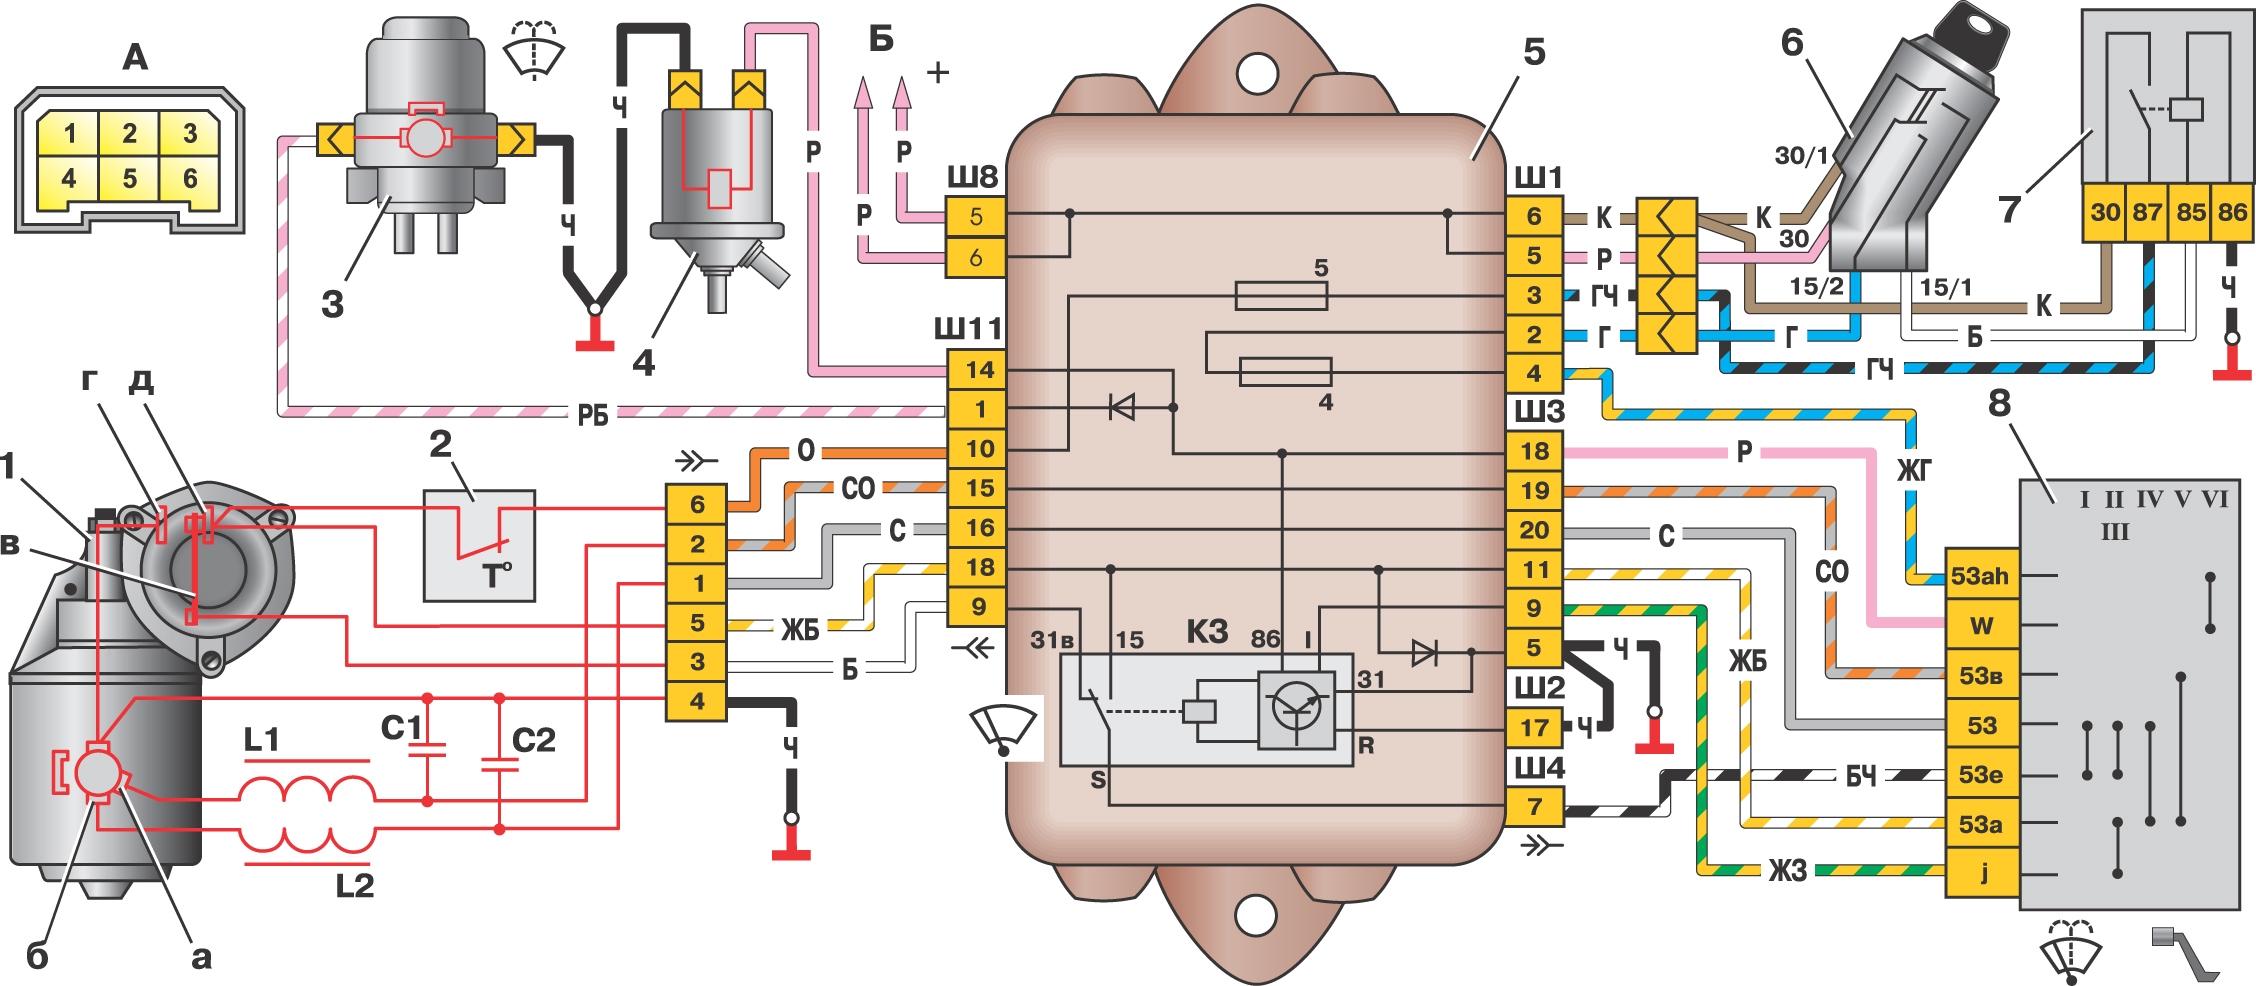 схема электро проводки инжектор нива евро 5 нива